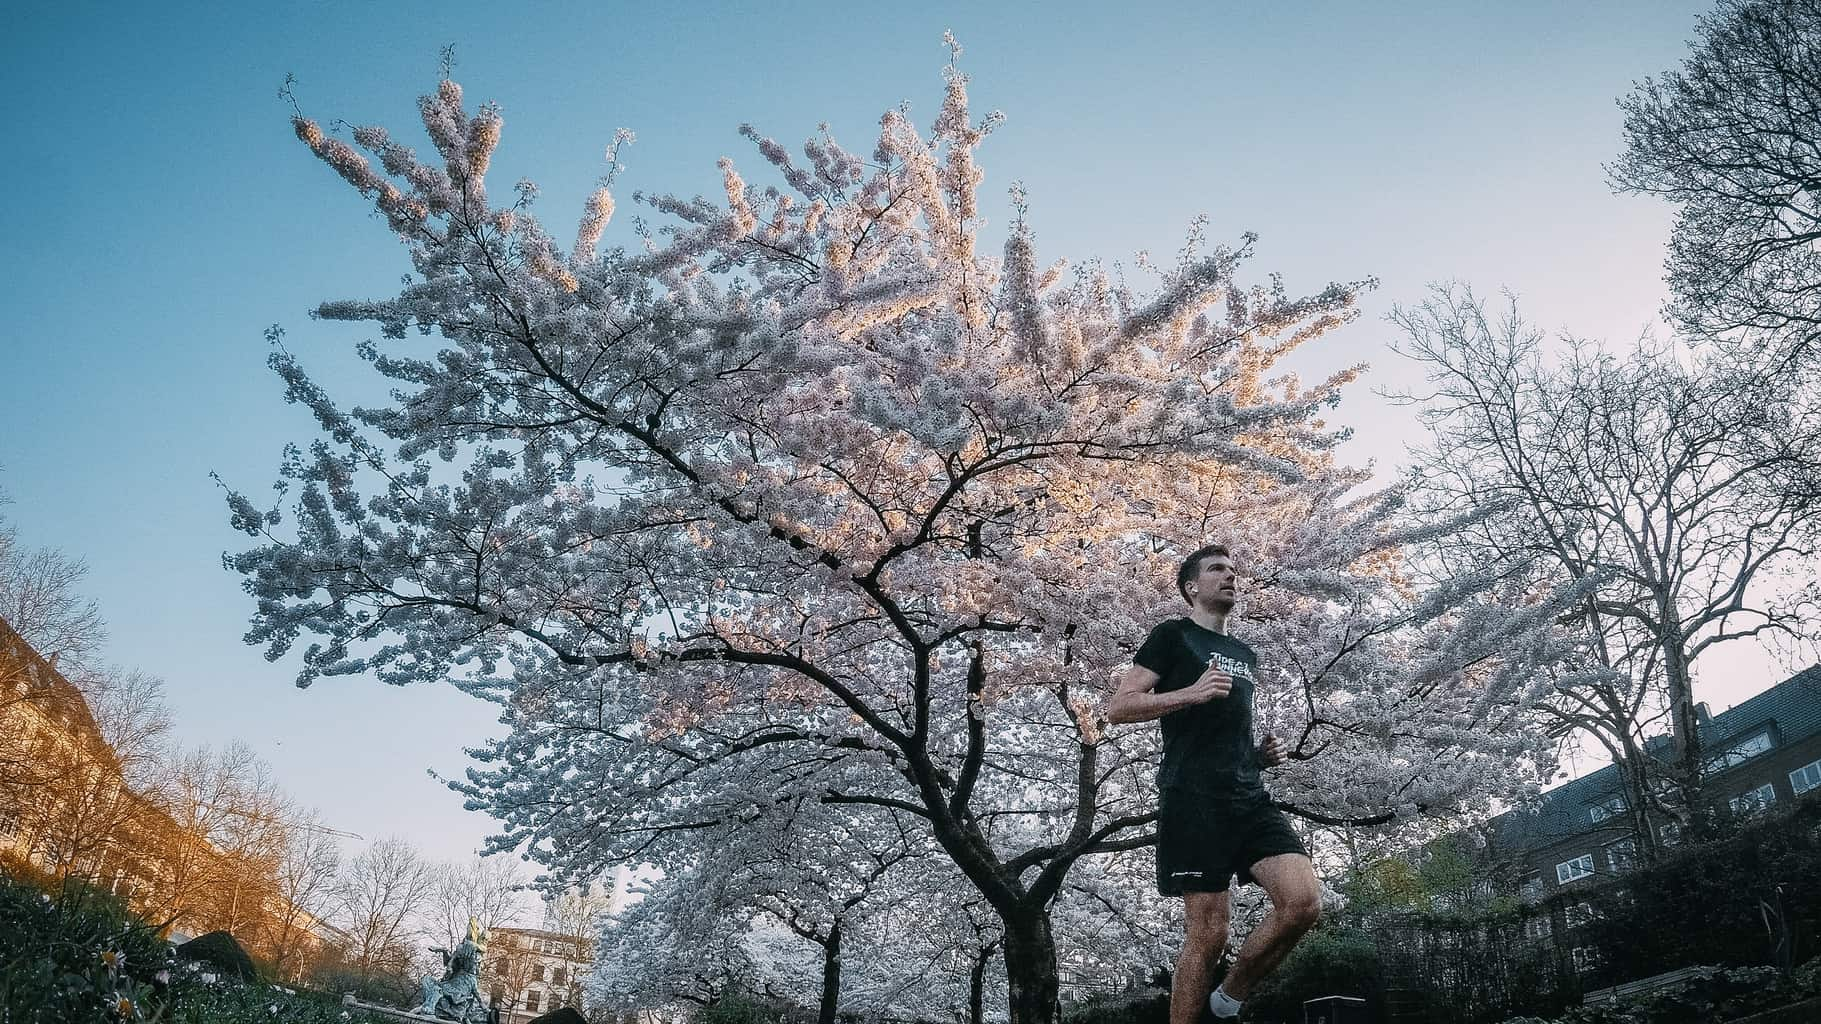 Rückblick zum ersten Frühlingswochenende